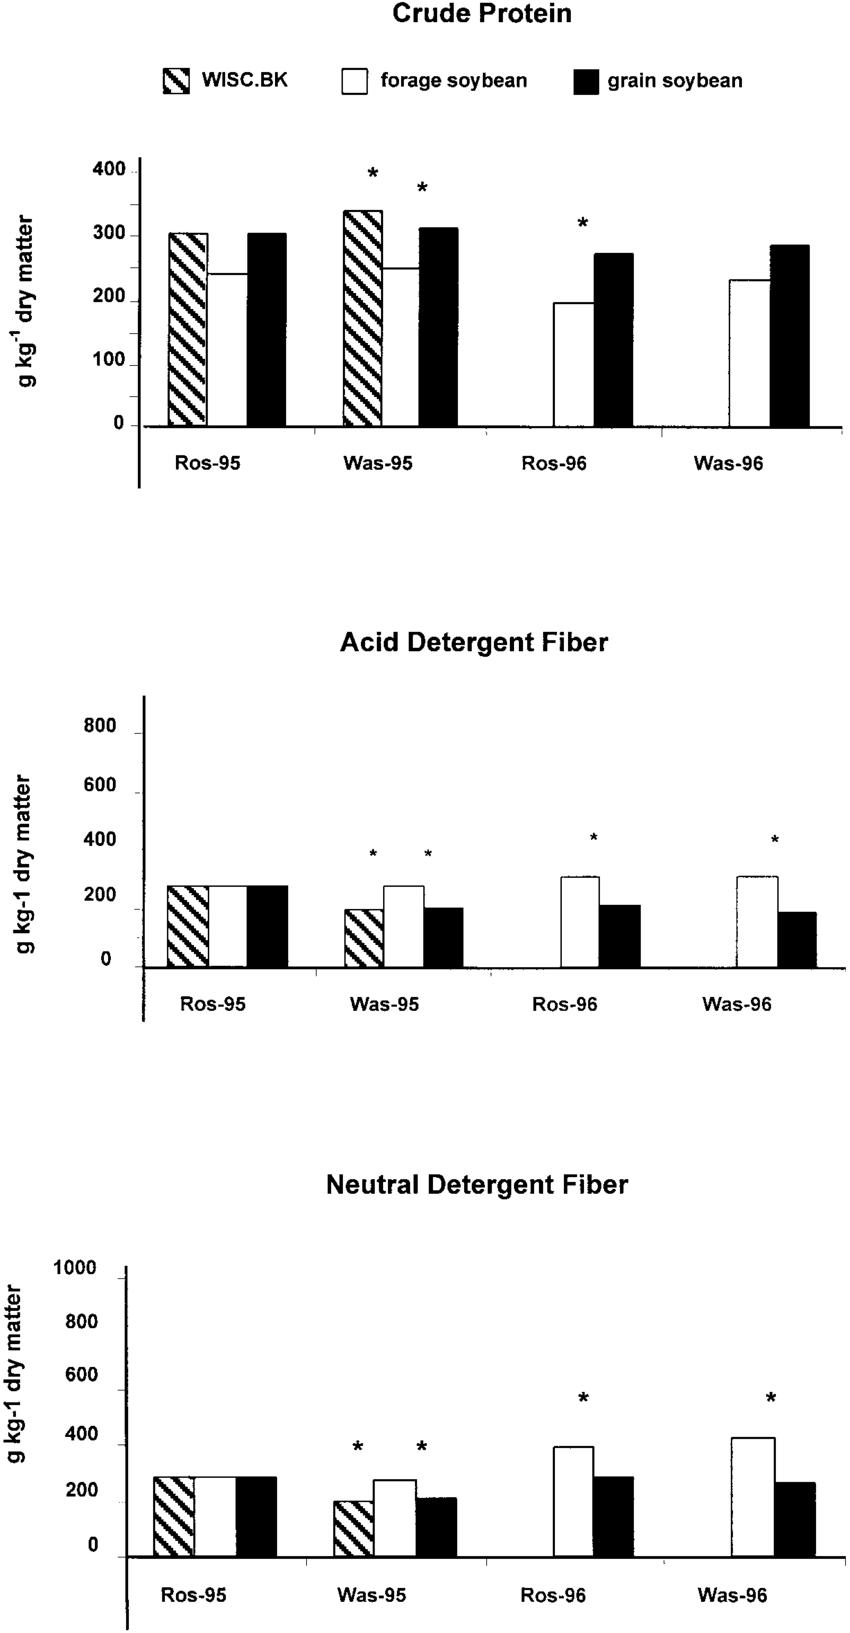 Average crude protein (CP), acid-detergent fiber (ADF